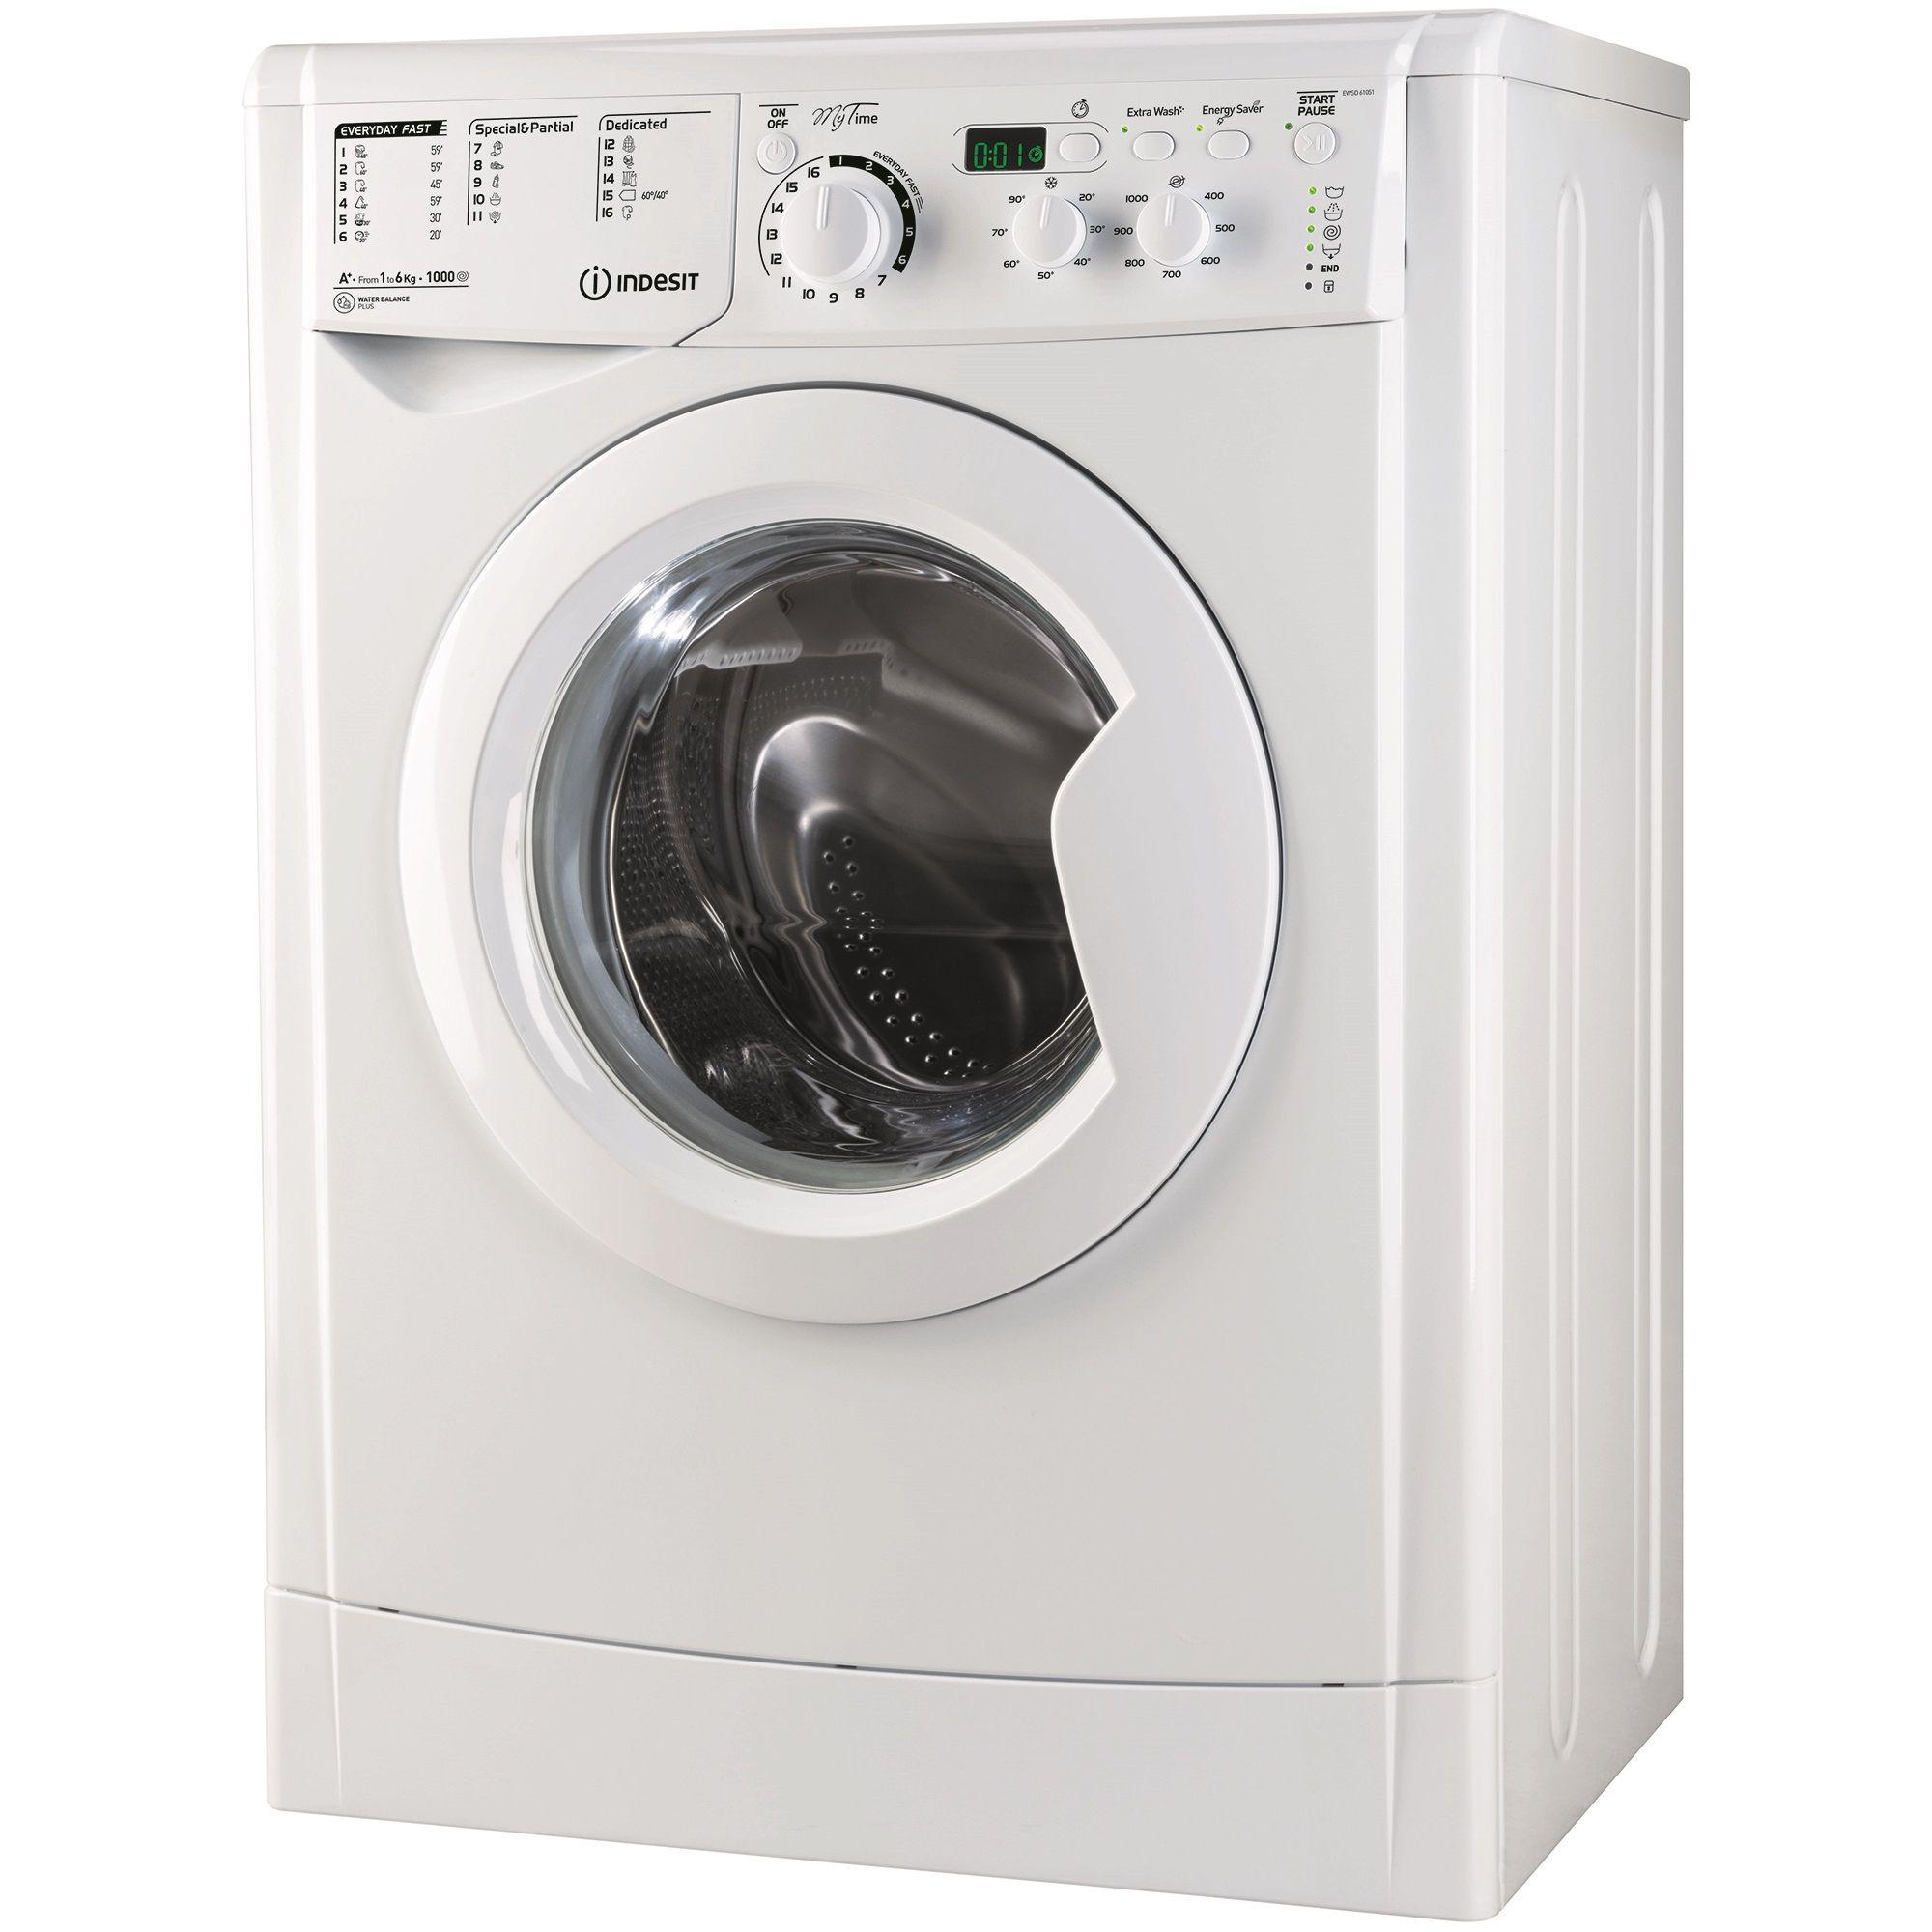 Пералня Indesit Slim EWSD 61051 W EU, 1000 об/мин, 6 кг, Клас A+, Бяла